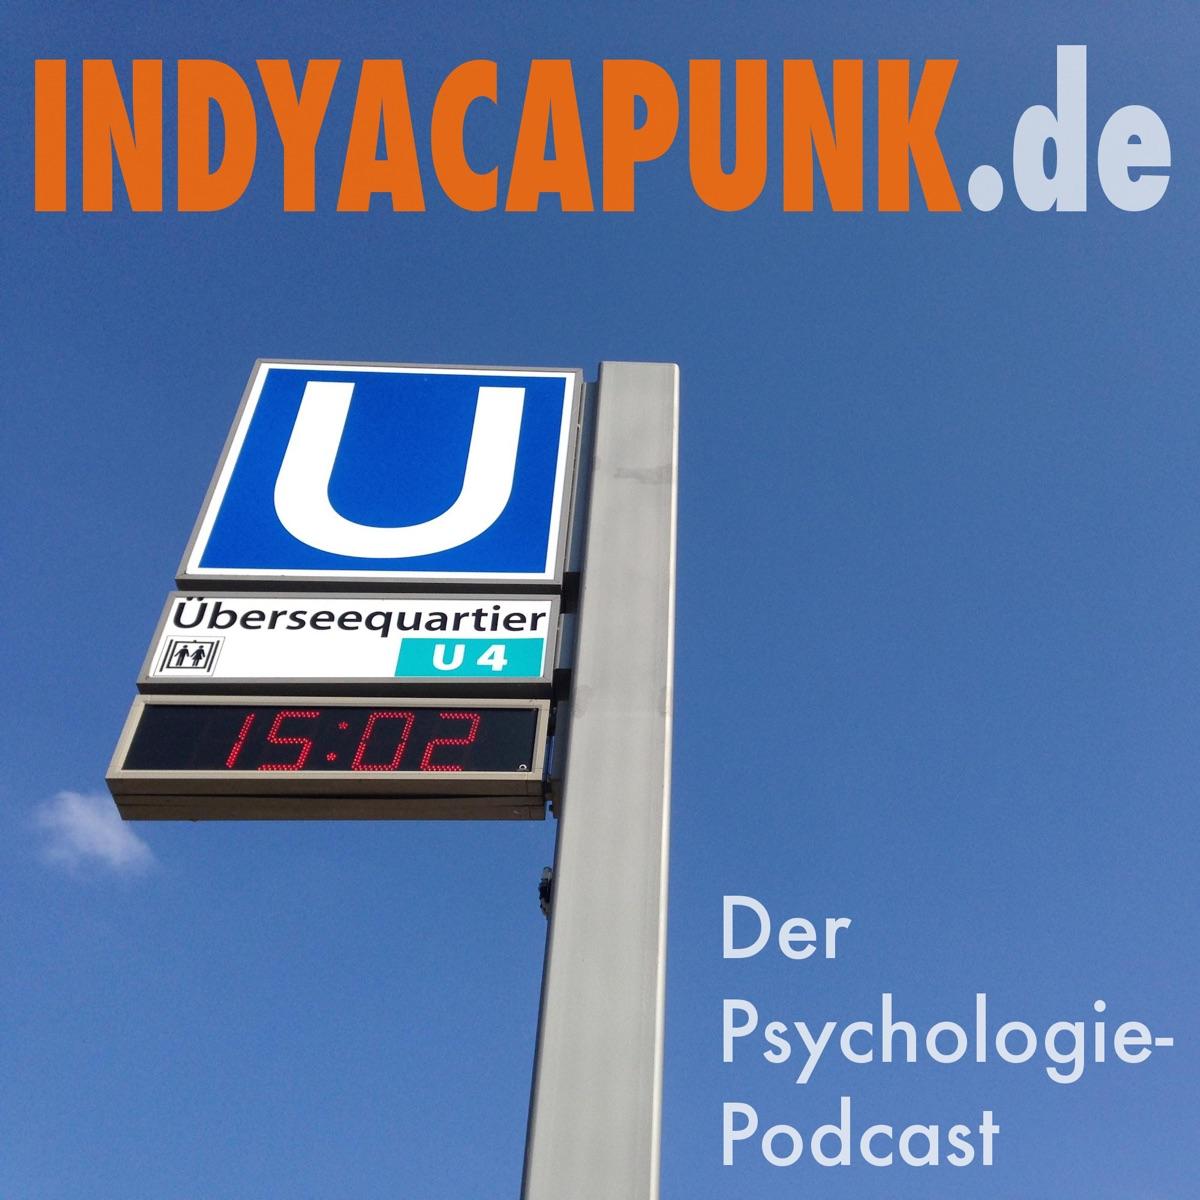 INDYACAPUNK Der Psychologie-Podcast